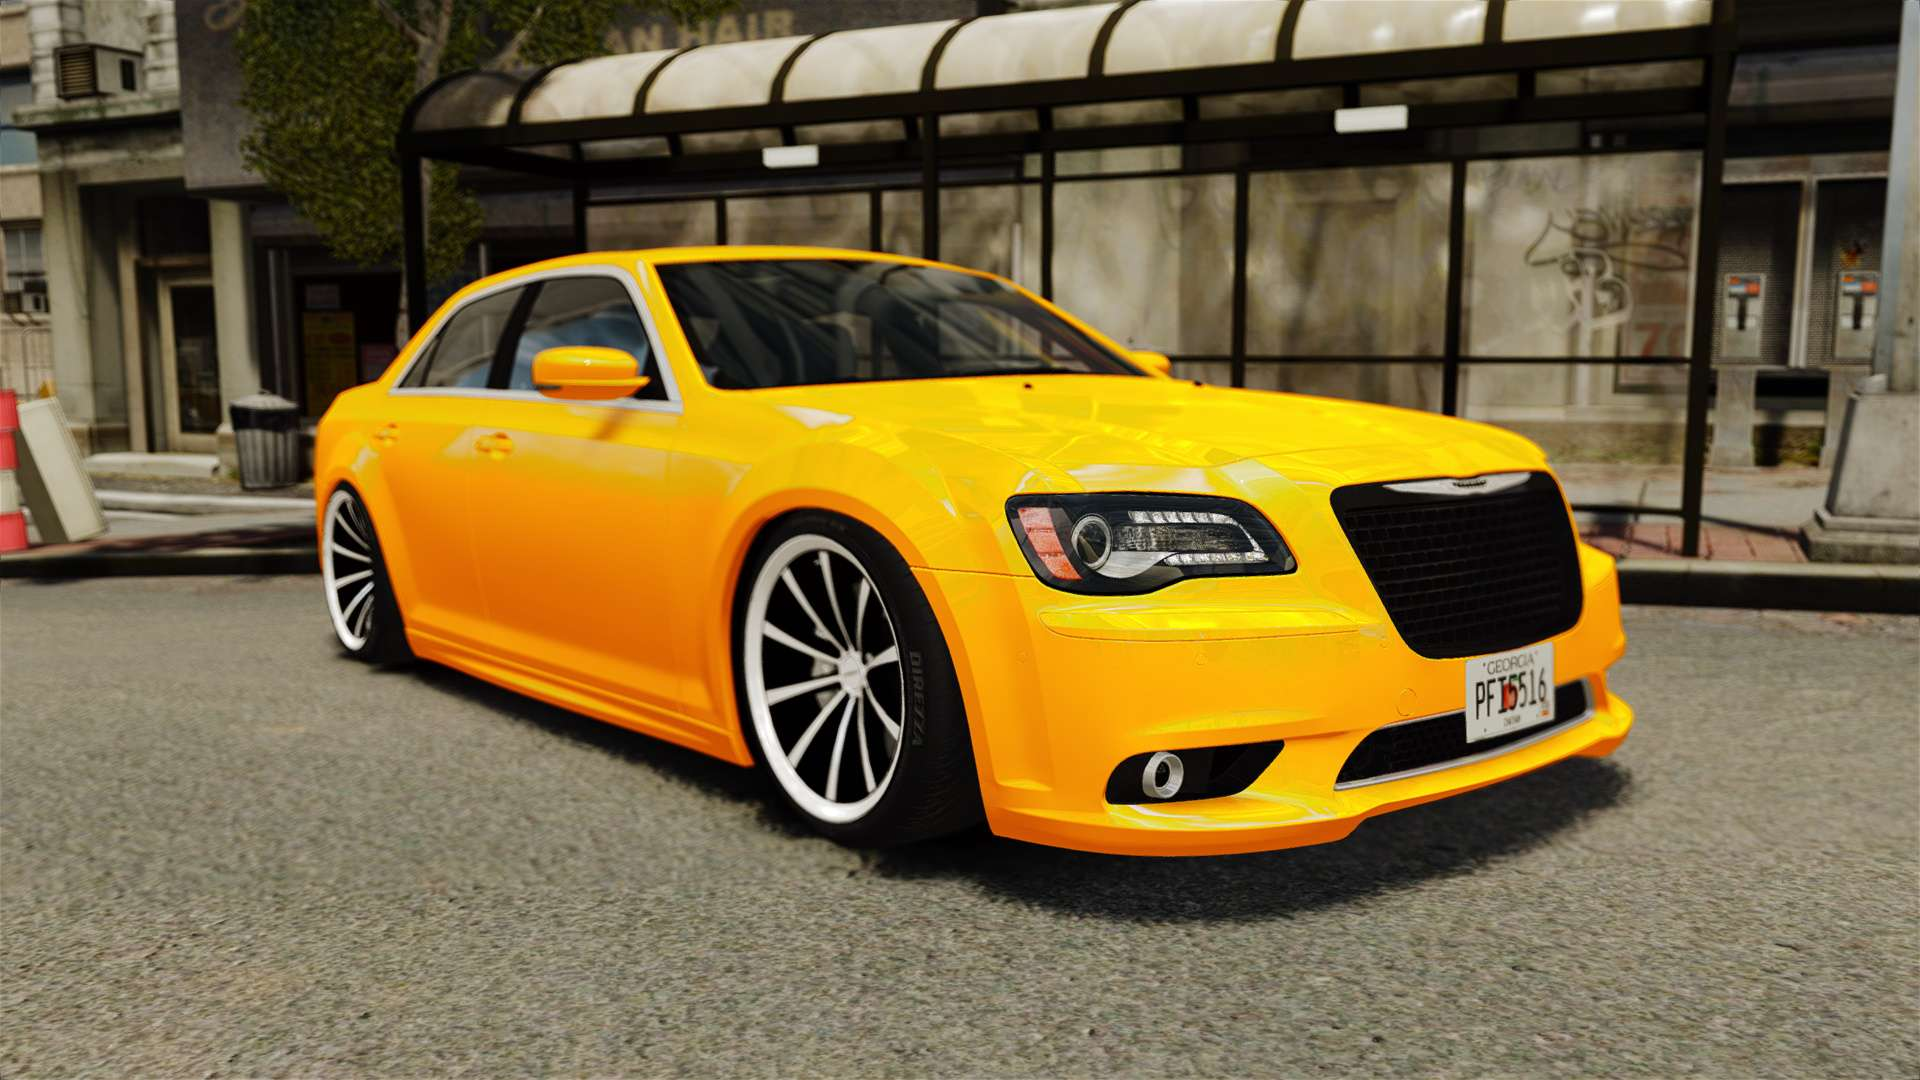 Chrysler 300 SRT8 LX 2012 for GTA 4 on gta 5 mitsubishi eclipse, gta 5 batmobile, gta 5 ferrari 250 gto, gta 5 mitsubishi galant, gta 5 volkswagen passat, gta 5 carbonizzare, gta 5 mitsubishi lancer, gta 5 eagle, gta 5 acura tl, gta 5 shelby mustang, gta 5 nissan 370z, gta 5 nissan gt-r, gta 5 holden commodore, gta 5 porsche 918, gta 5 jaguar x-type, gta 5 chevy malibu, gta 5 nissan 240sx, gta 5 ford bronco, gta 5 hennessey venom gt, gta 5 acura nsx,